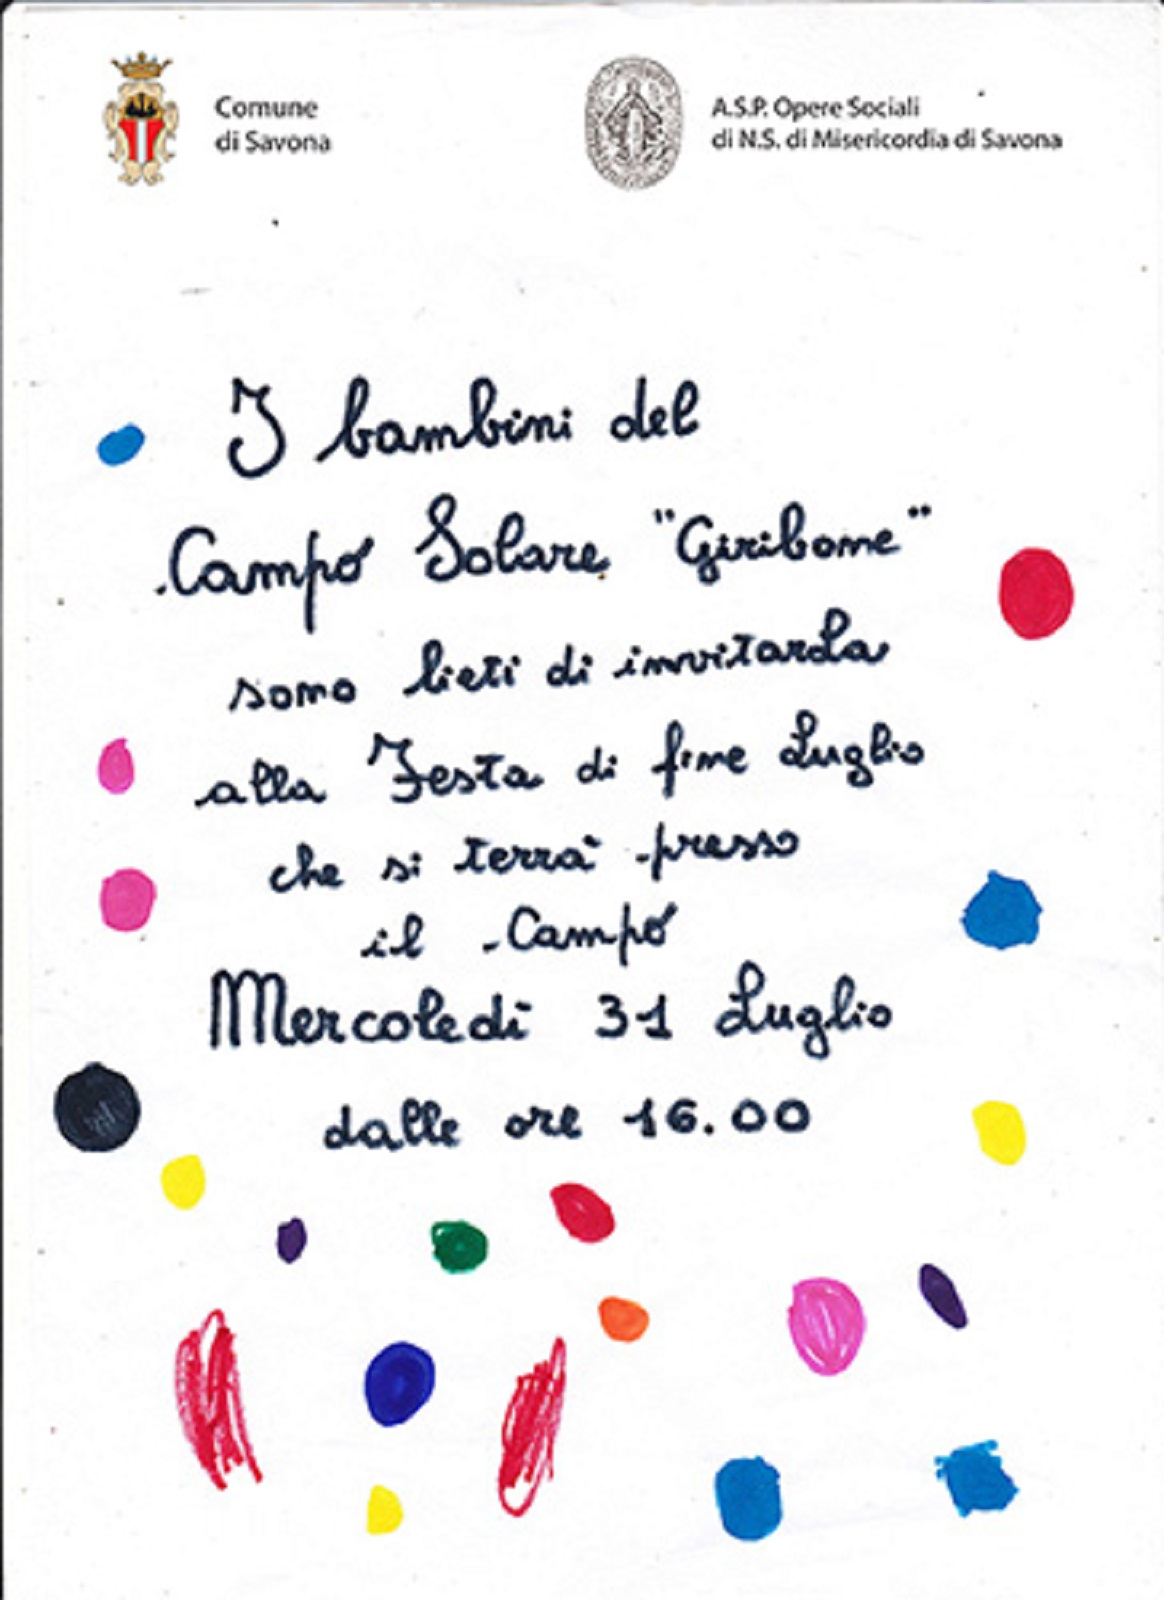 Campo Solare Giribone Savona Festa